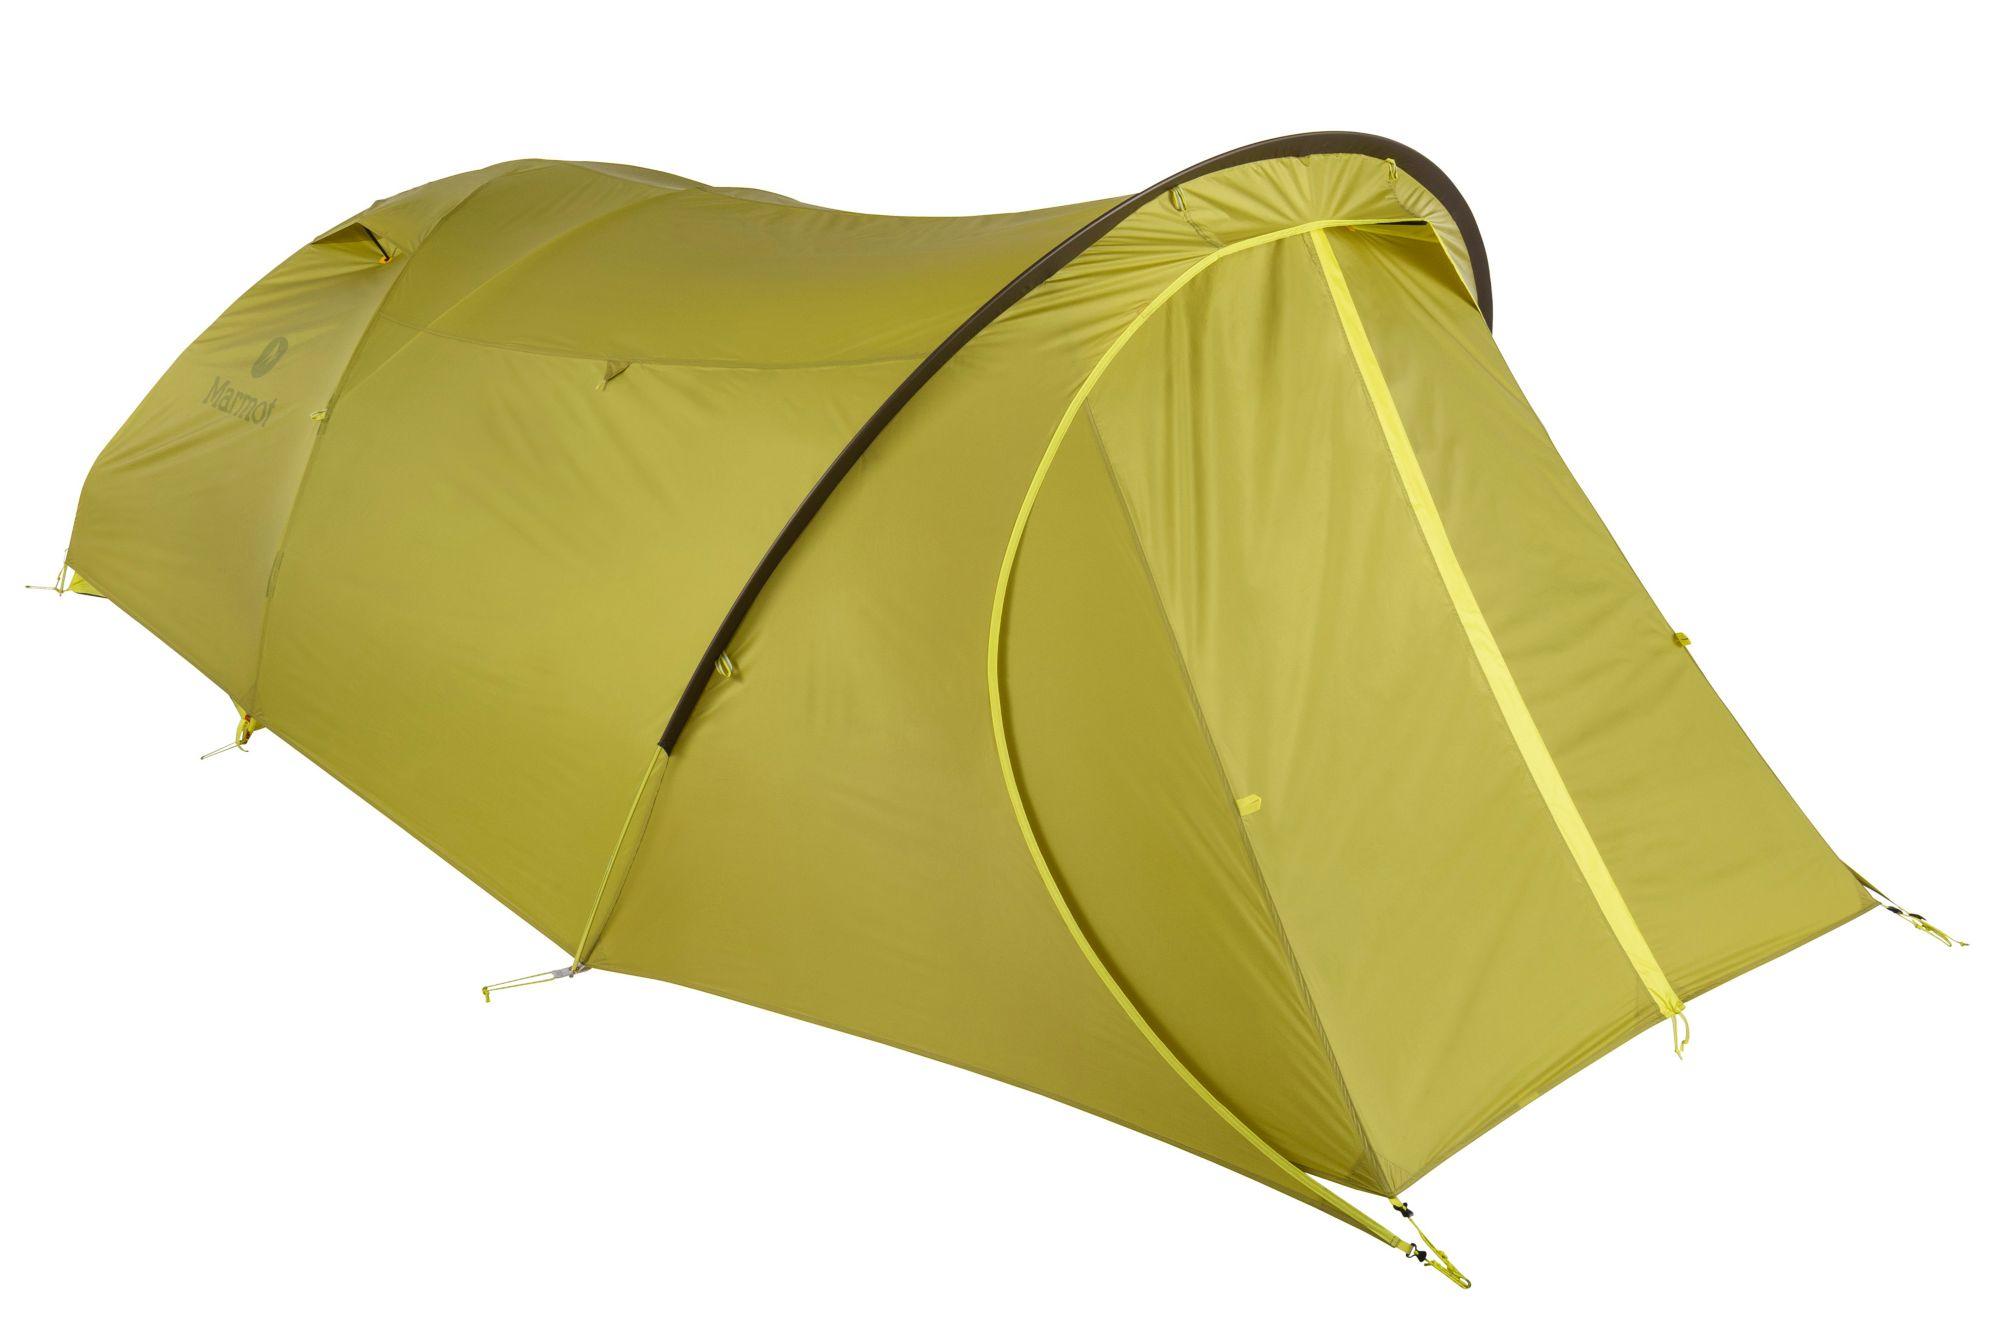 ... Tungsten Ultralight Hatchback 2-Person Tent image 4 ...  sc 1 st  Marmot & Tungsten Ultralight Hatchback 2-Person Tent